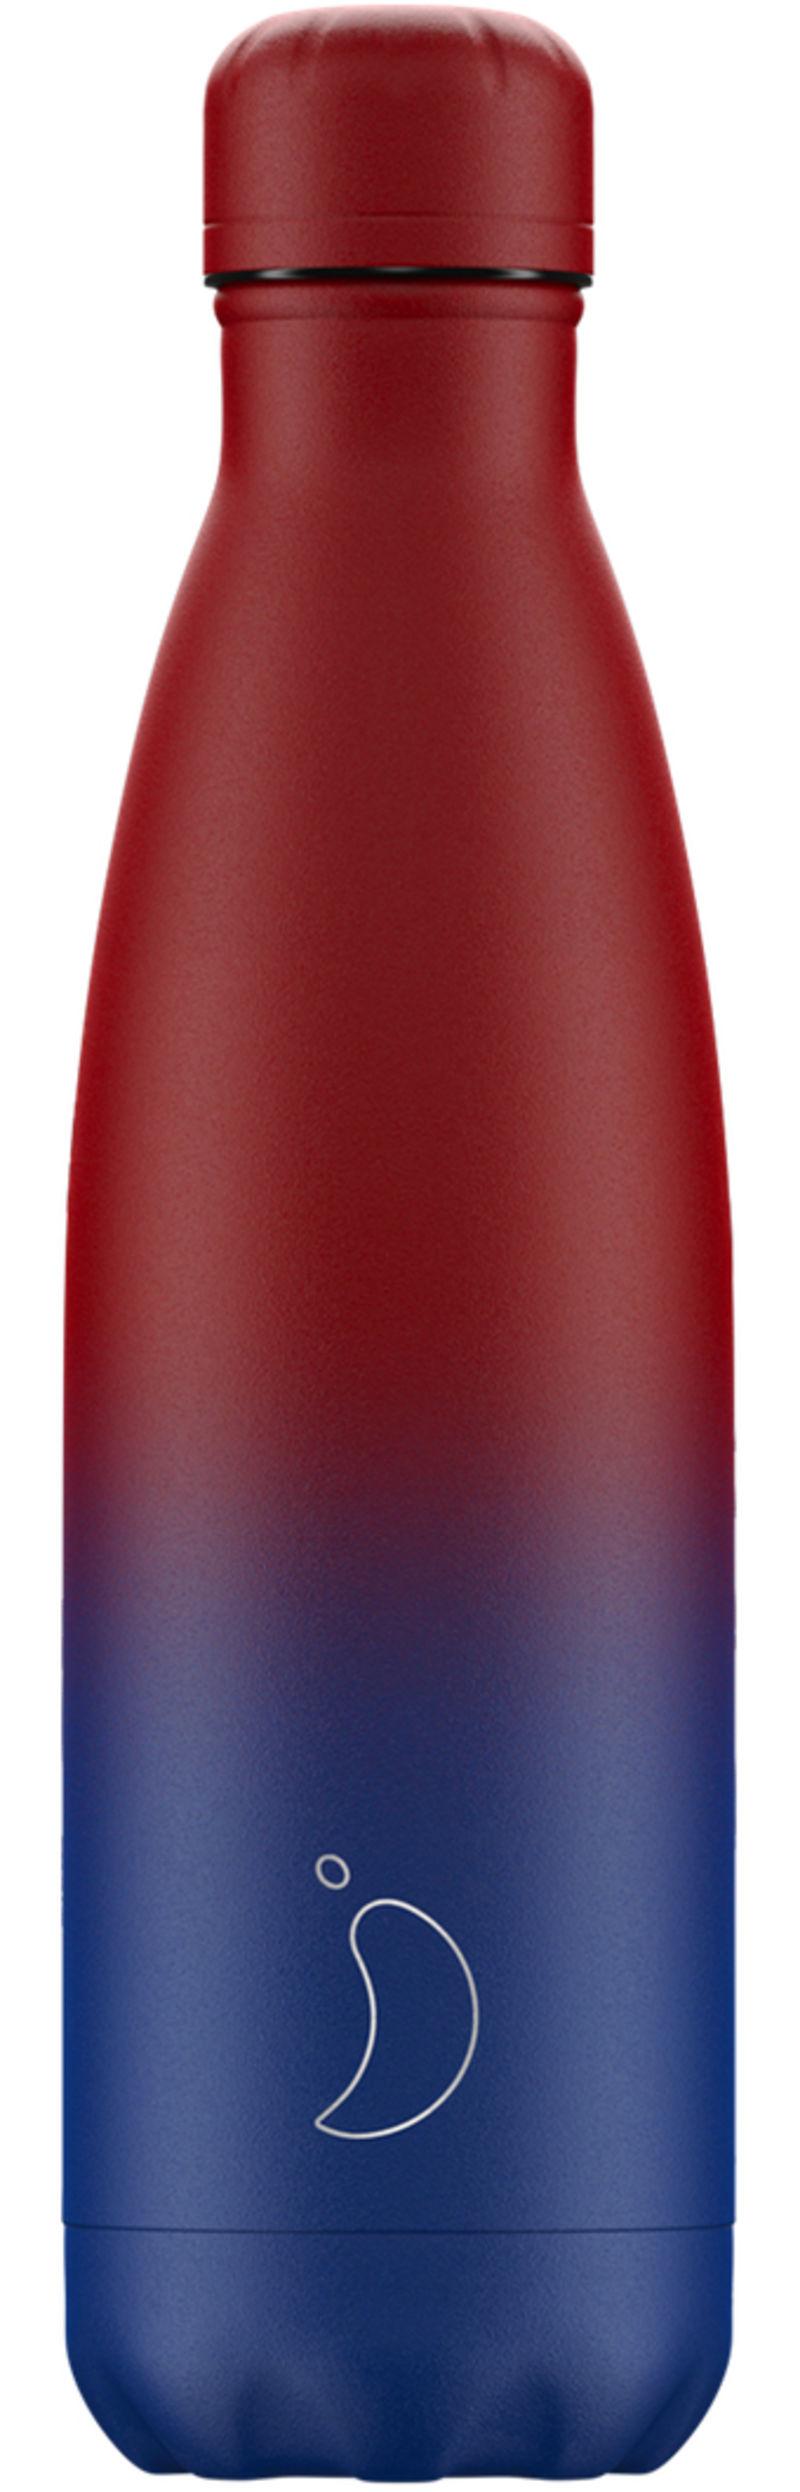 Botella Inox Gradient Mate Azul&rosa 500ml -